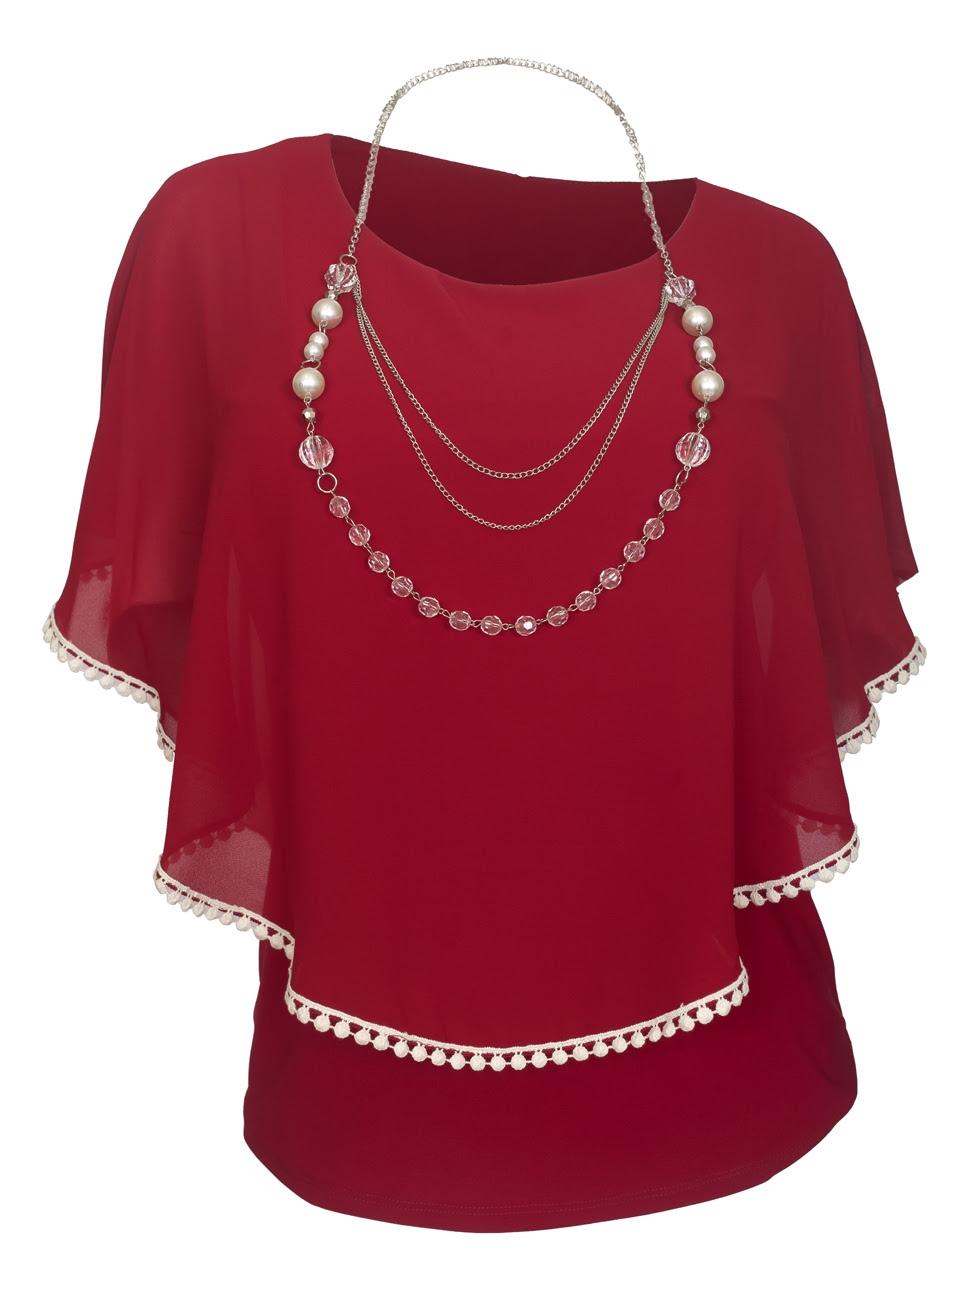 Plus Size Layered Poncho Top Crochet Trim Burgundy 1792